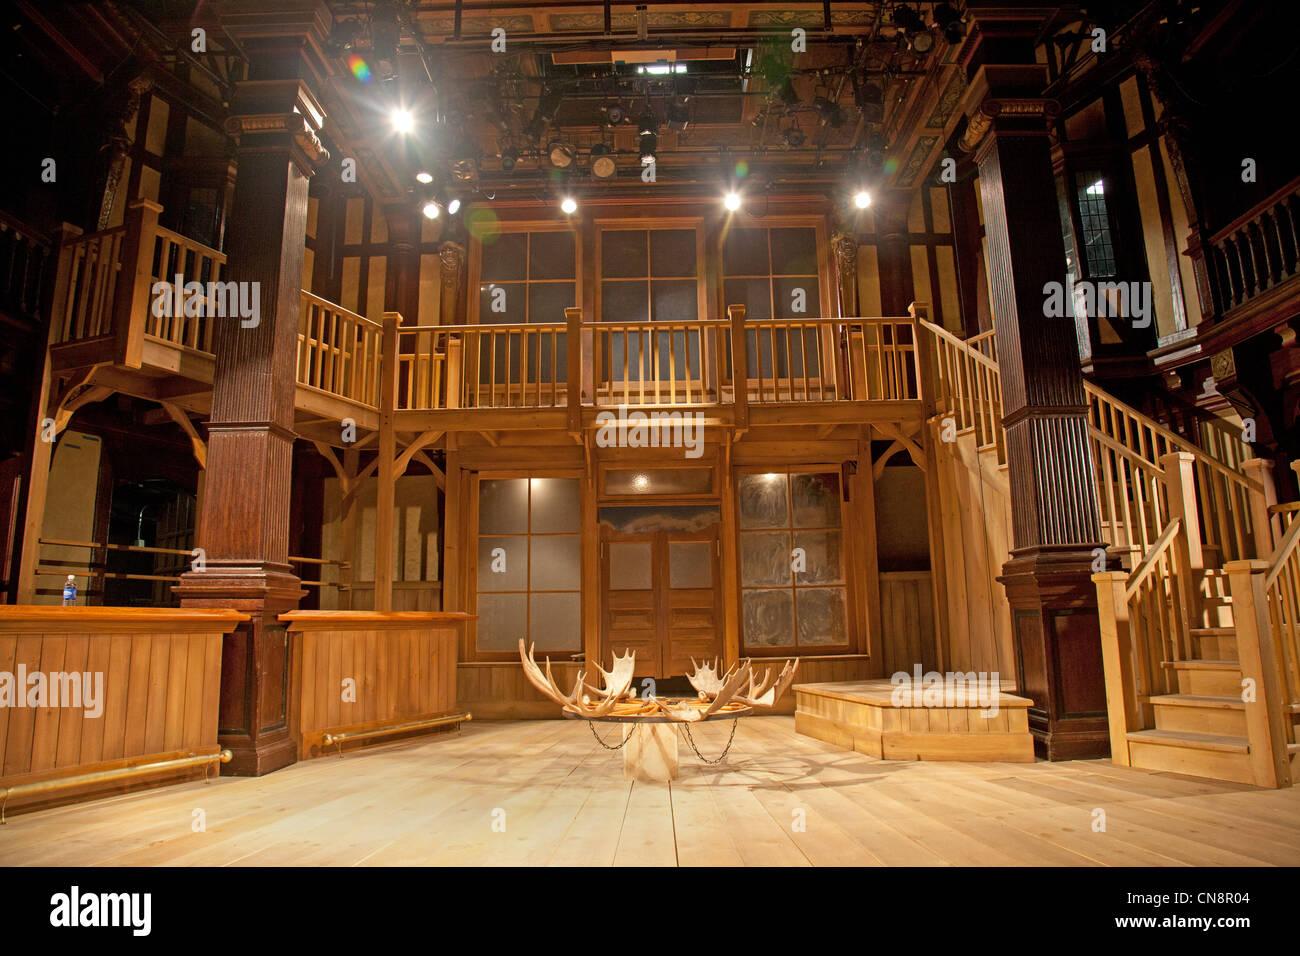 Folger Shakespeare theatre in Washington DC - Stock Image